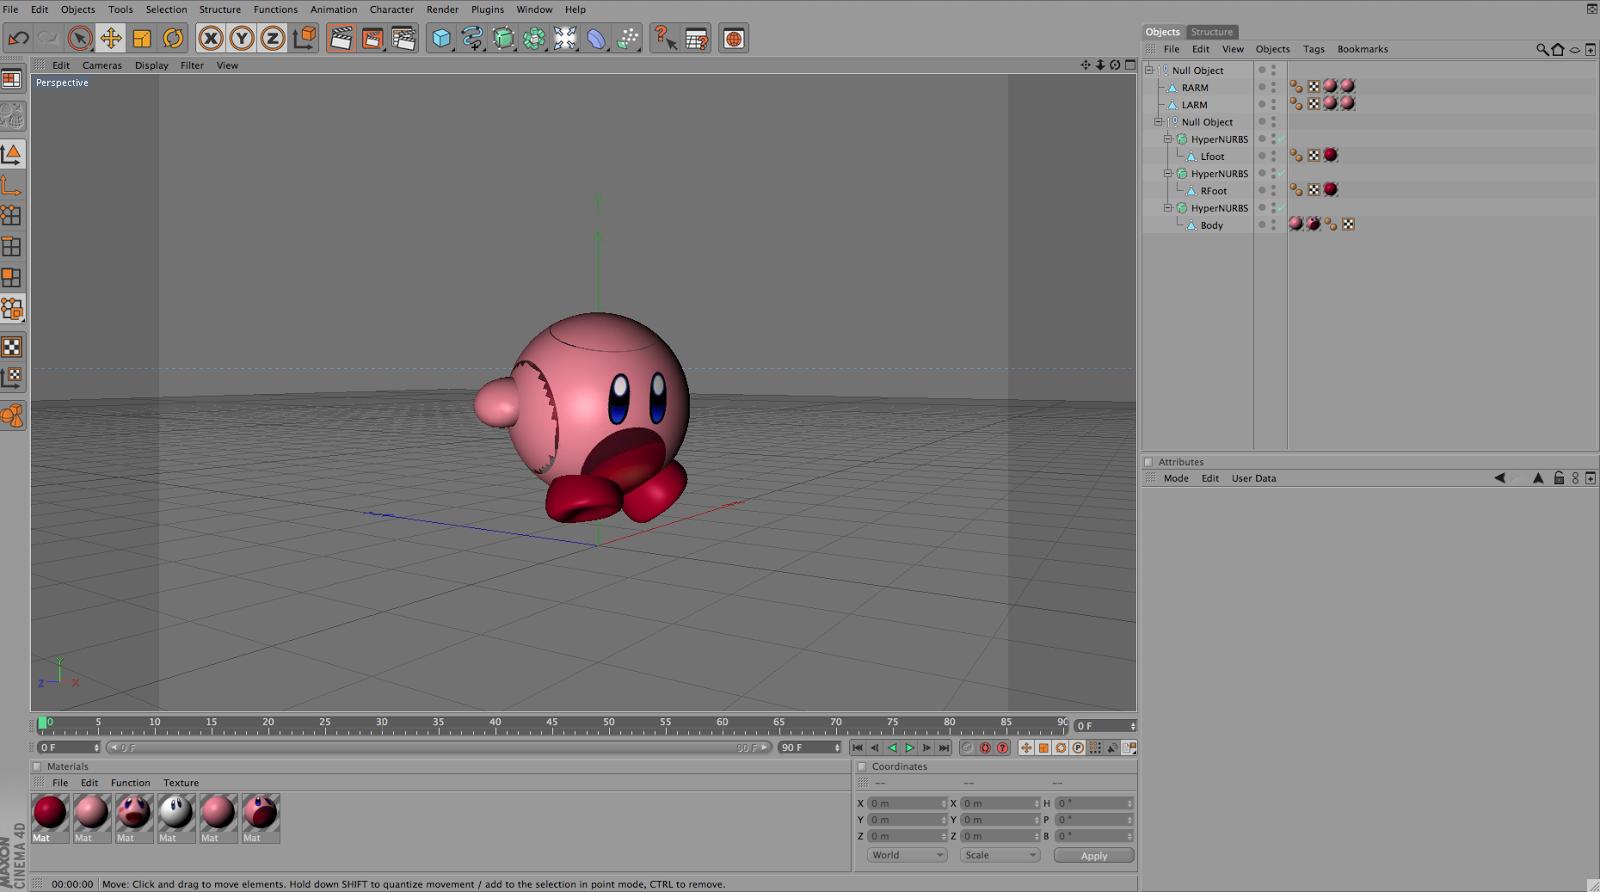 Cinema 4d blog : Kirby character